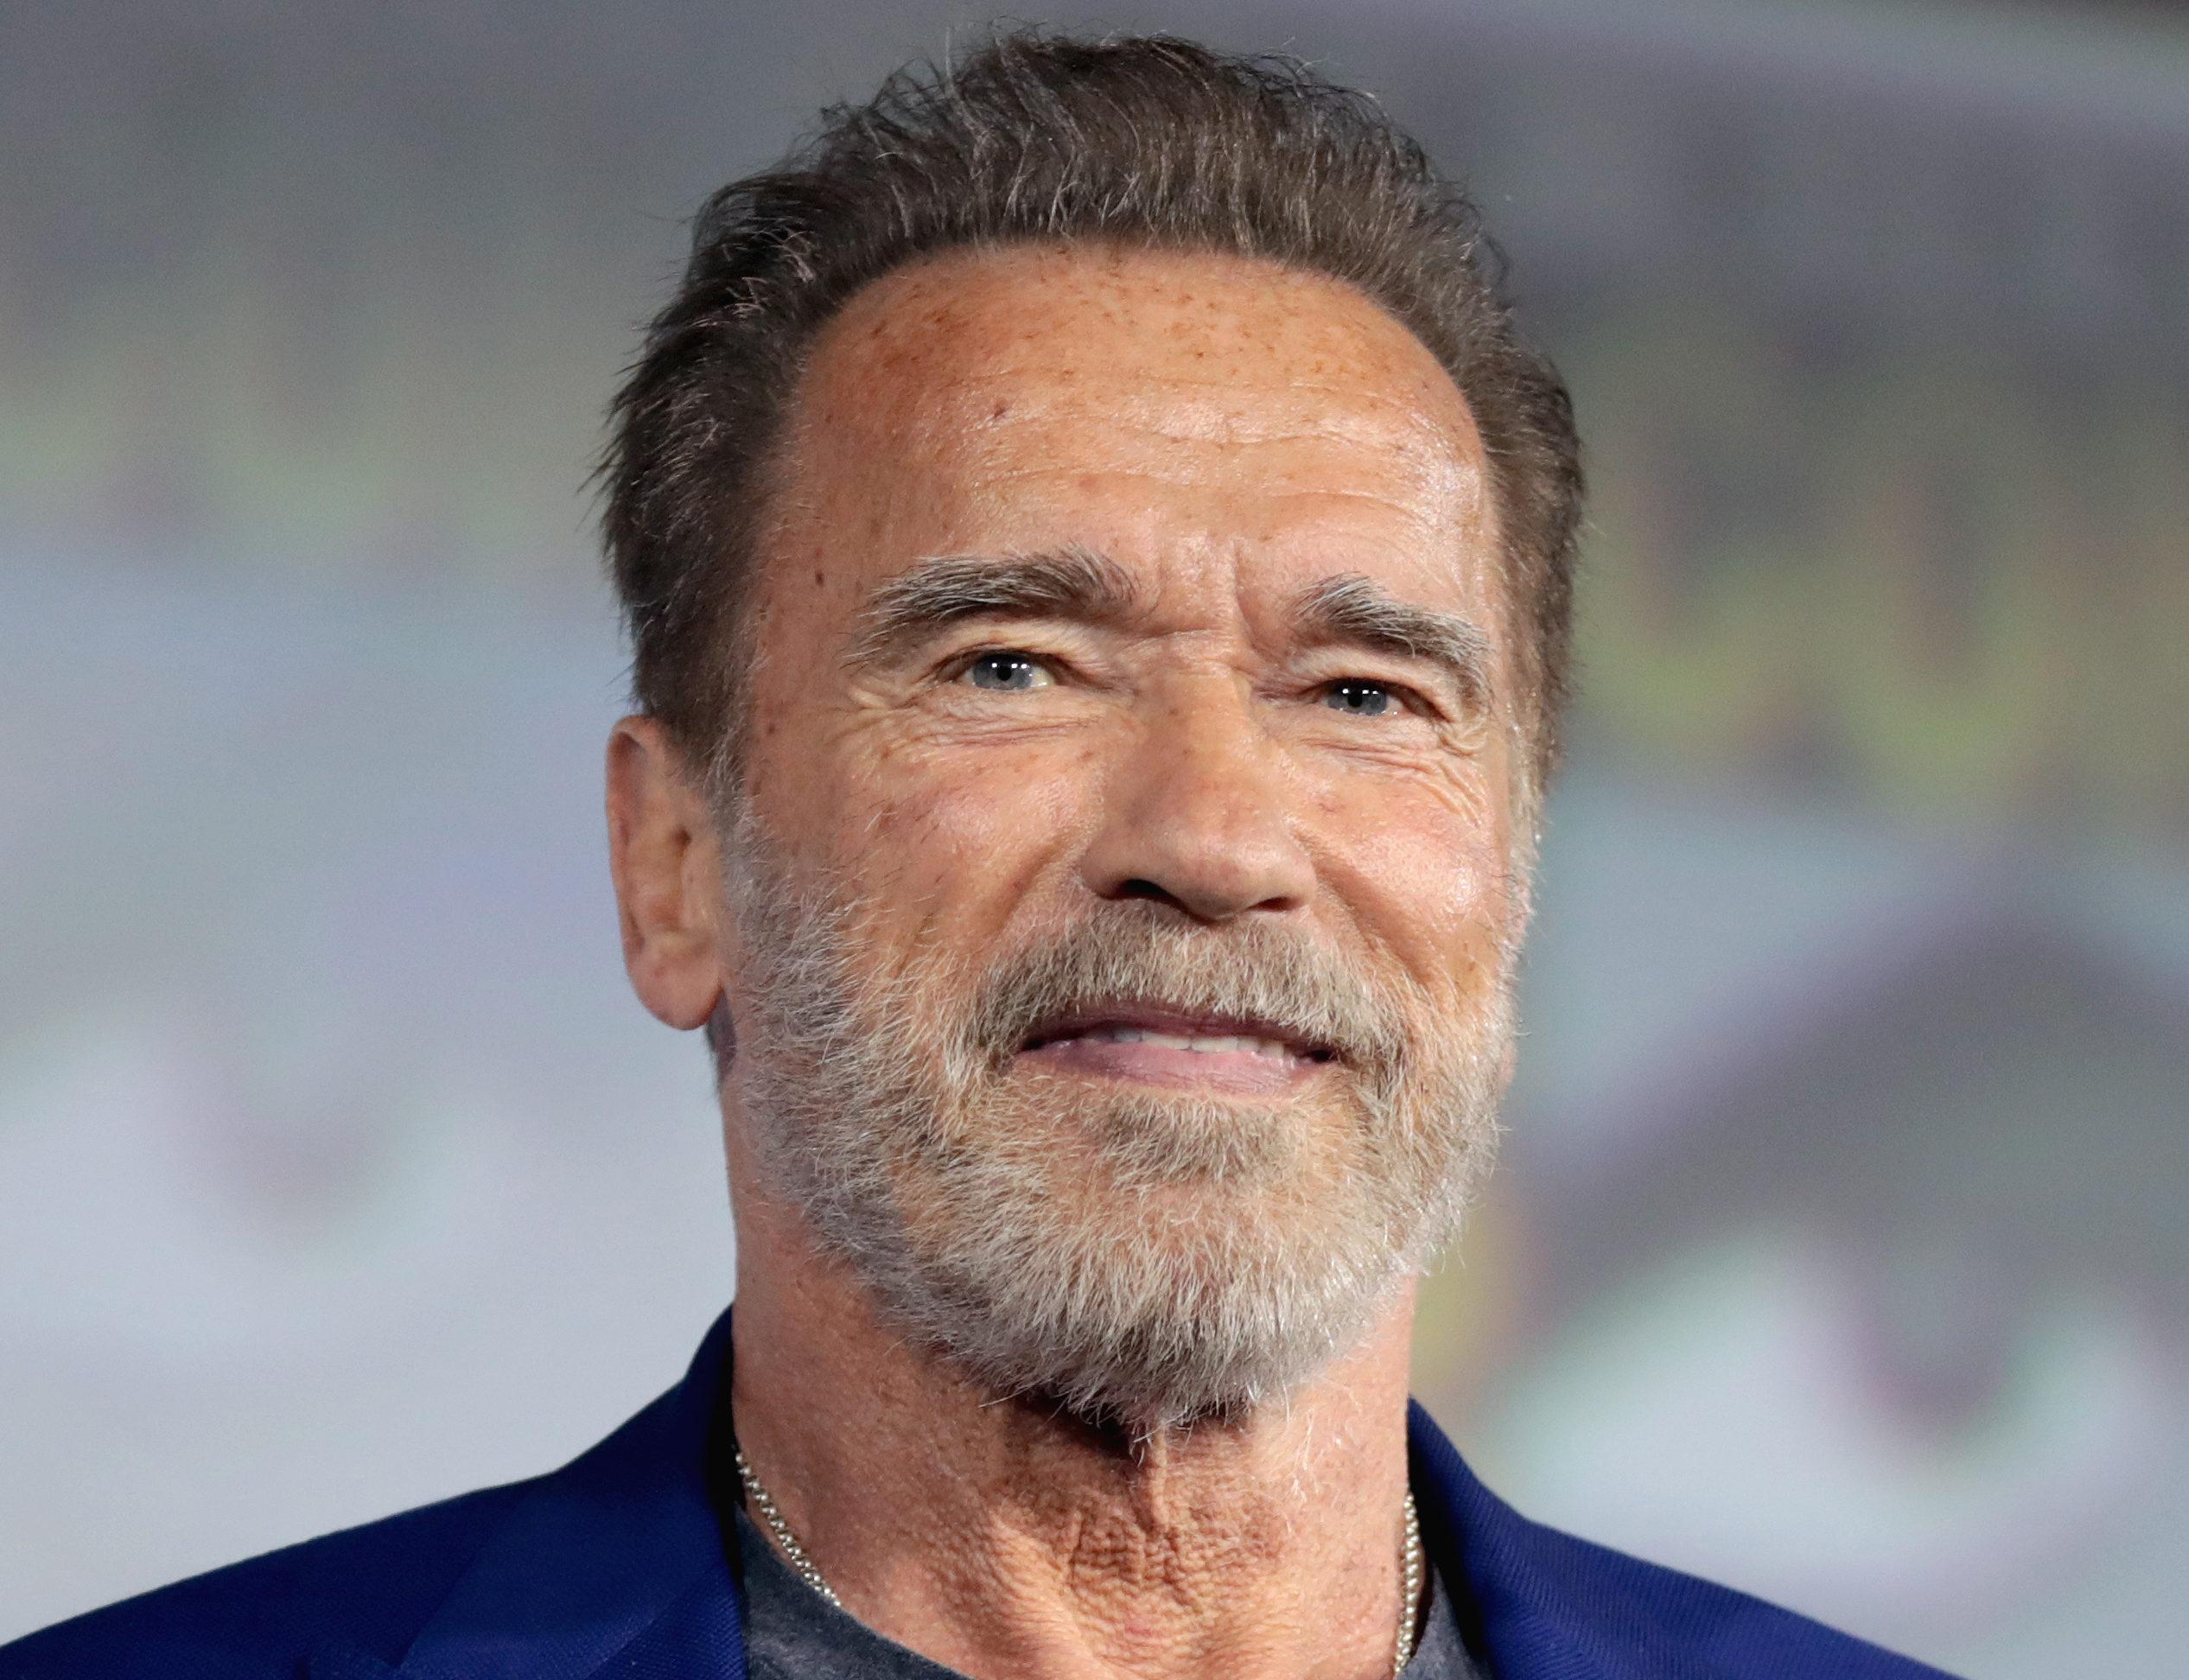 Arnold Schwarzenegger protagonista di una serie Netflix: tutti i dettagli!